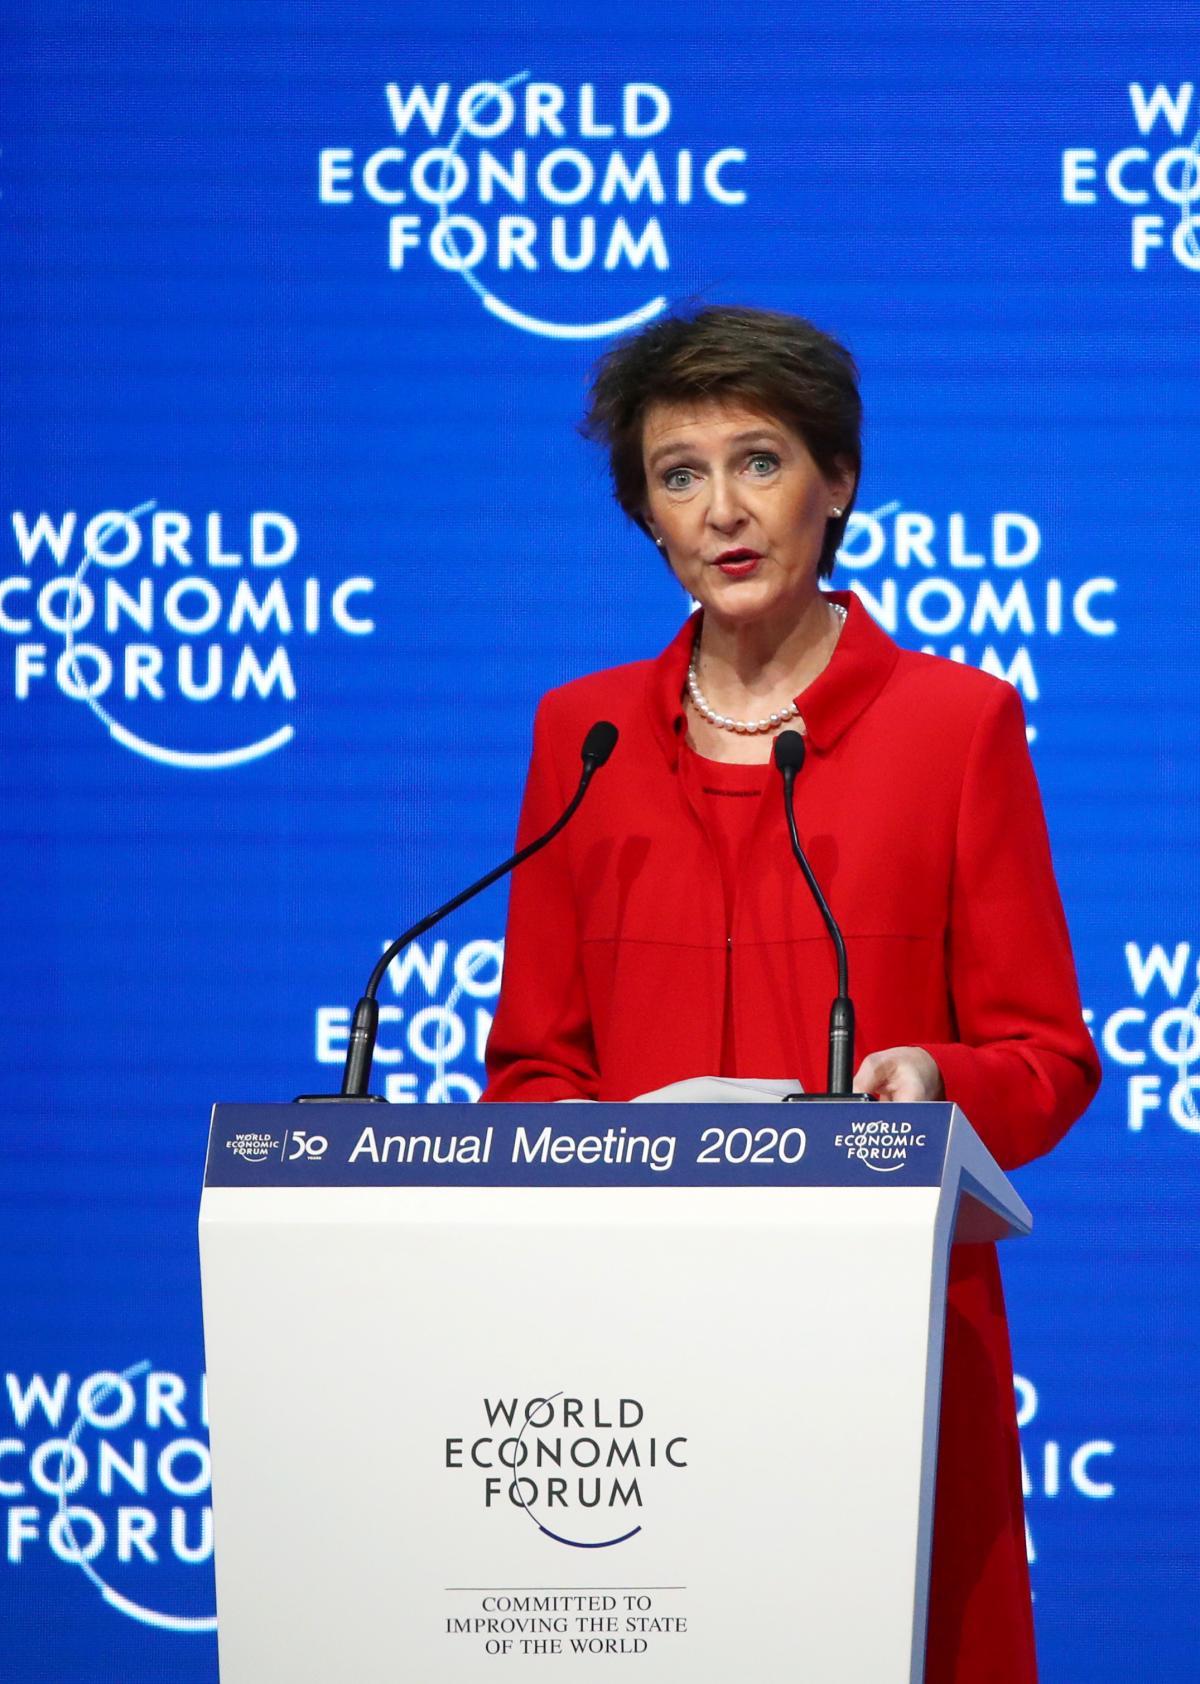 Simonetta Sommaruga at WEF 2020 / REUTERS